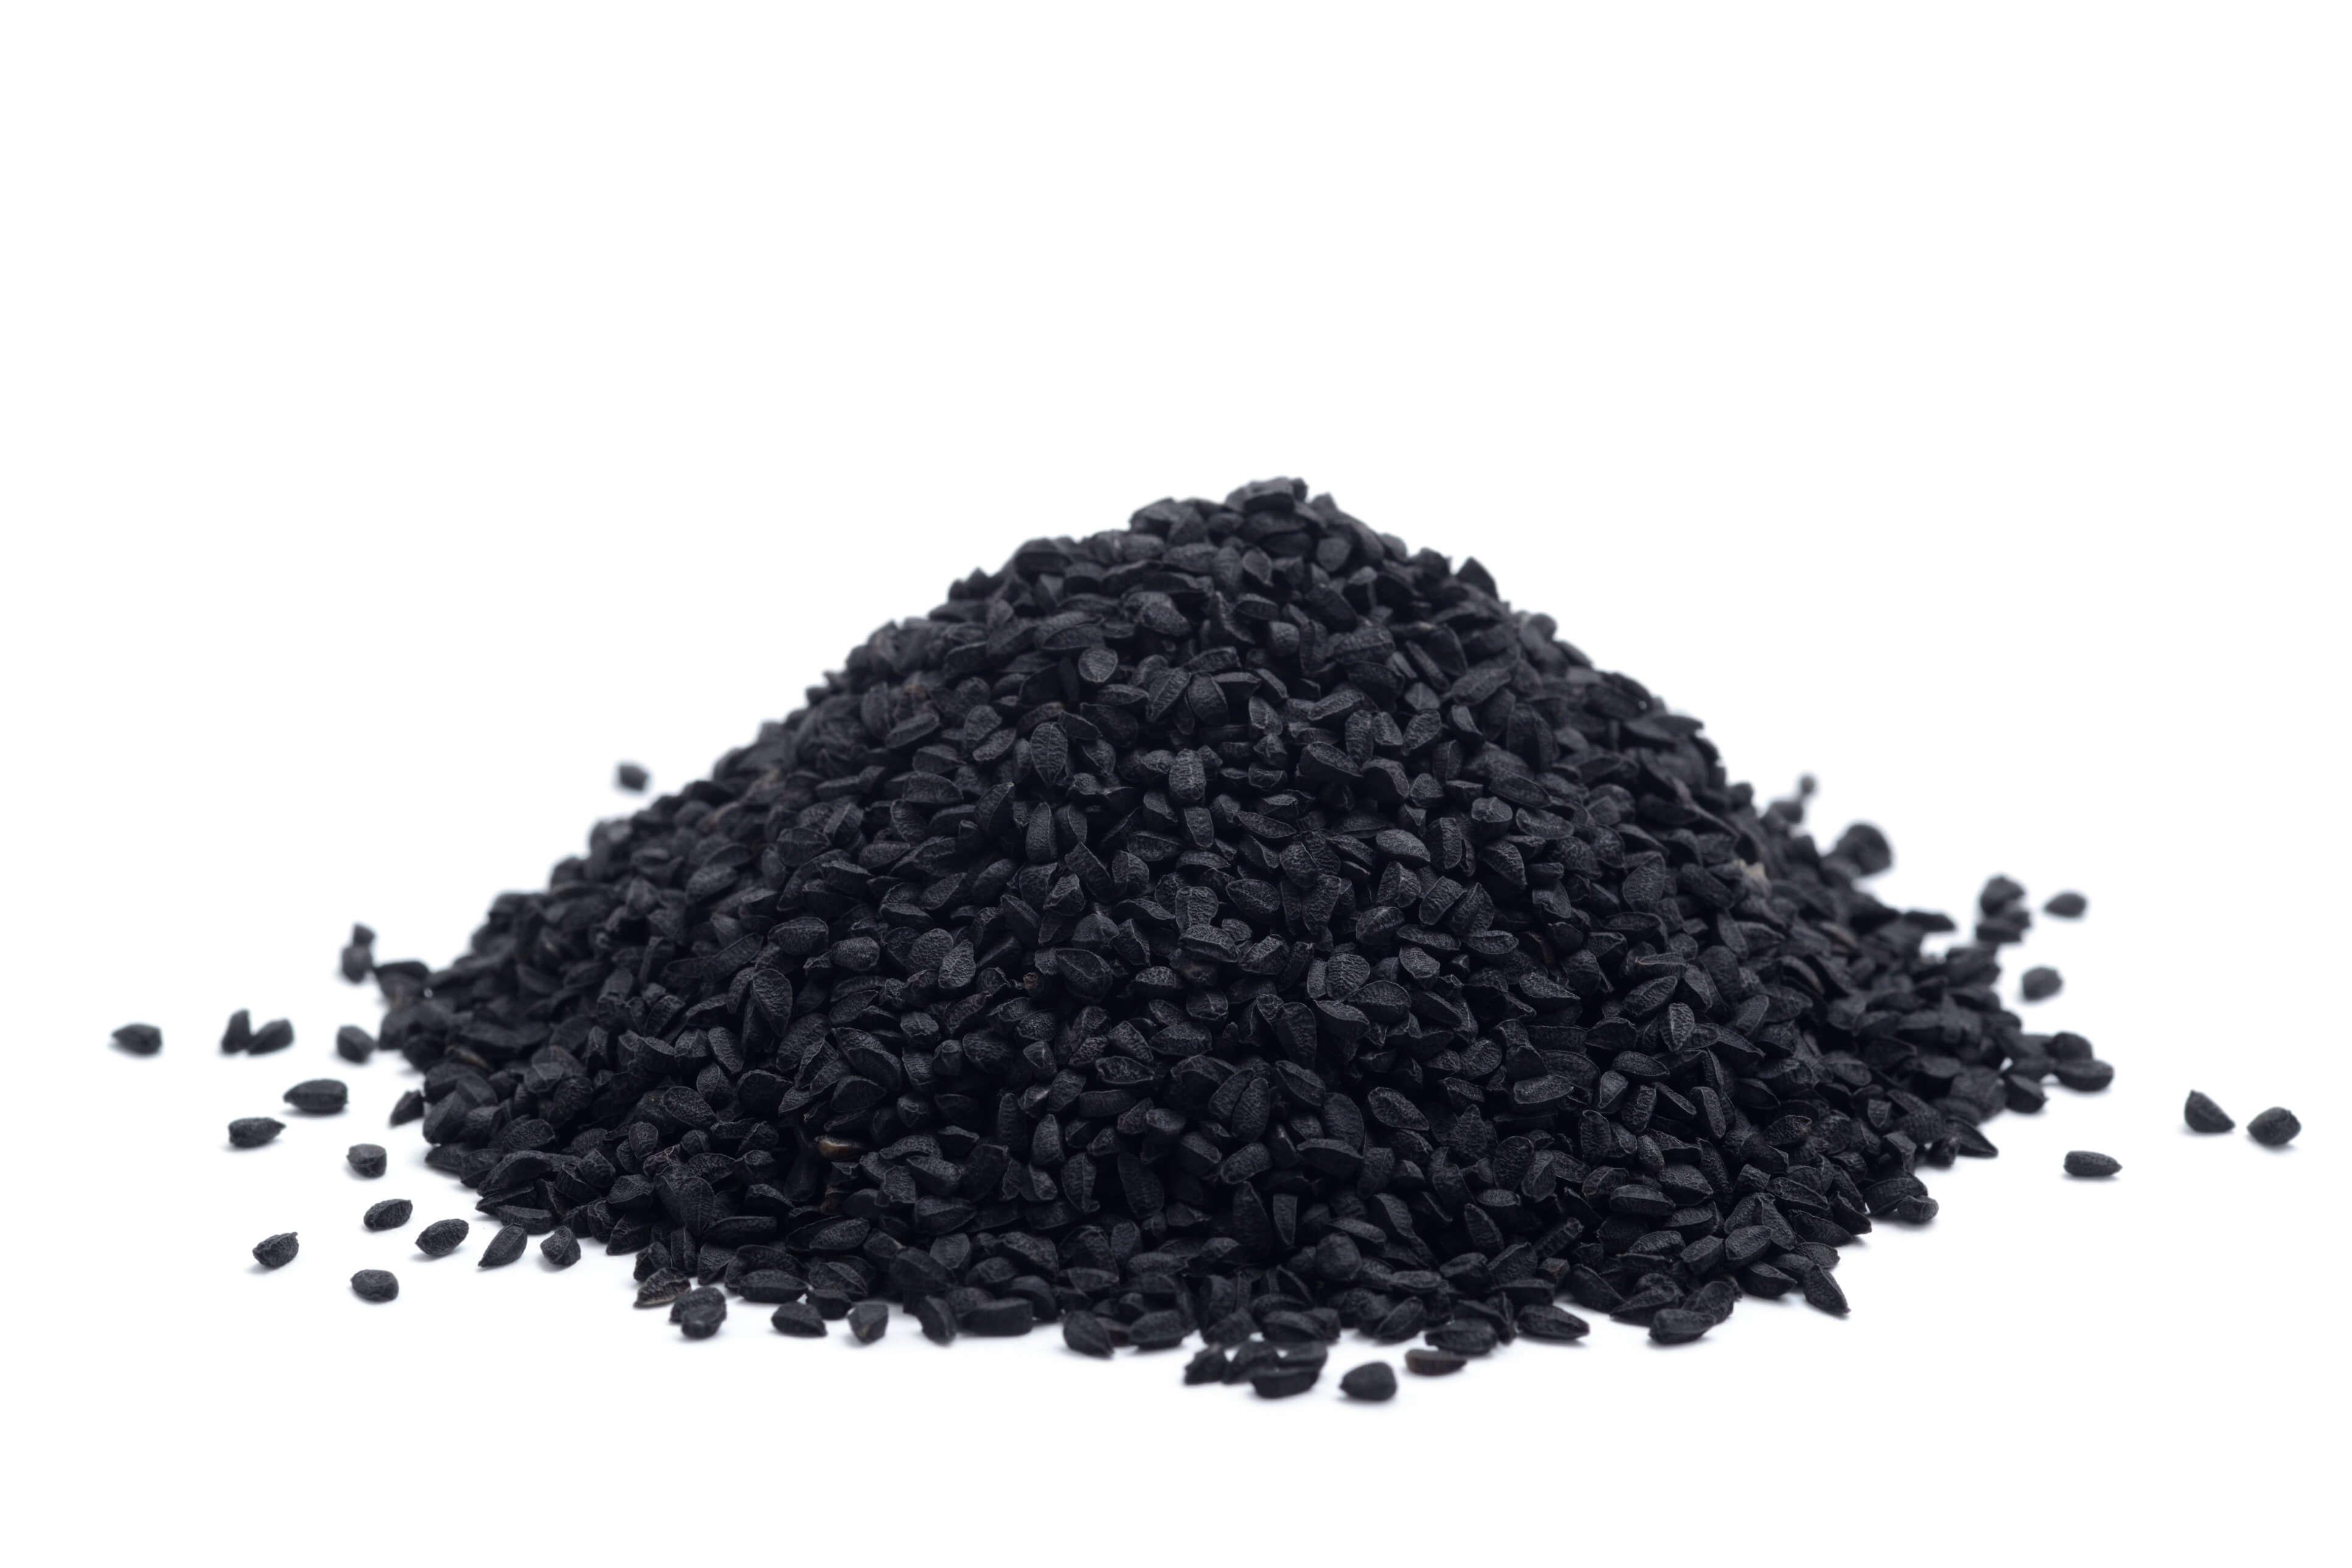 What are the Benefits of Nigella Sativa Oil?